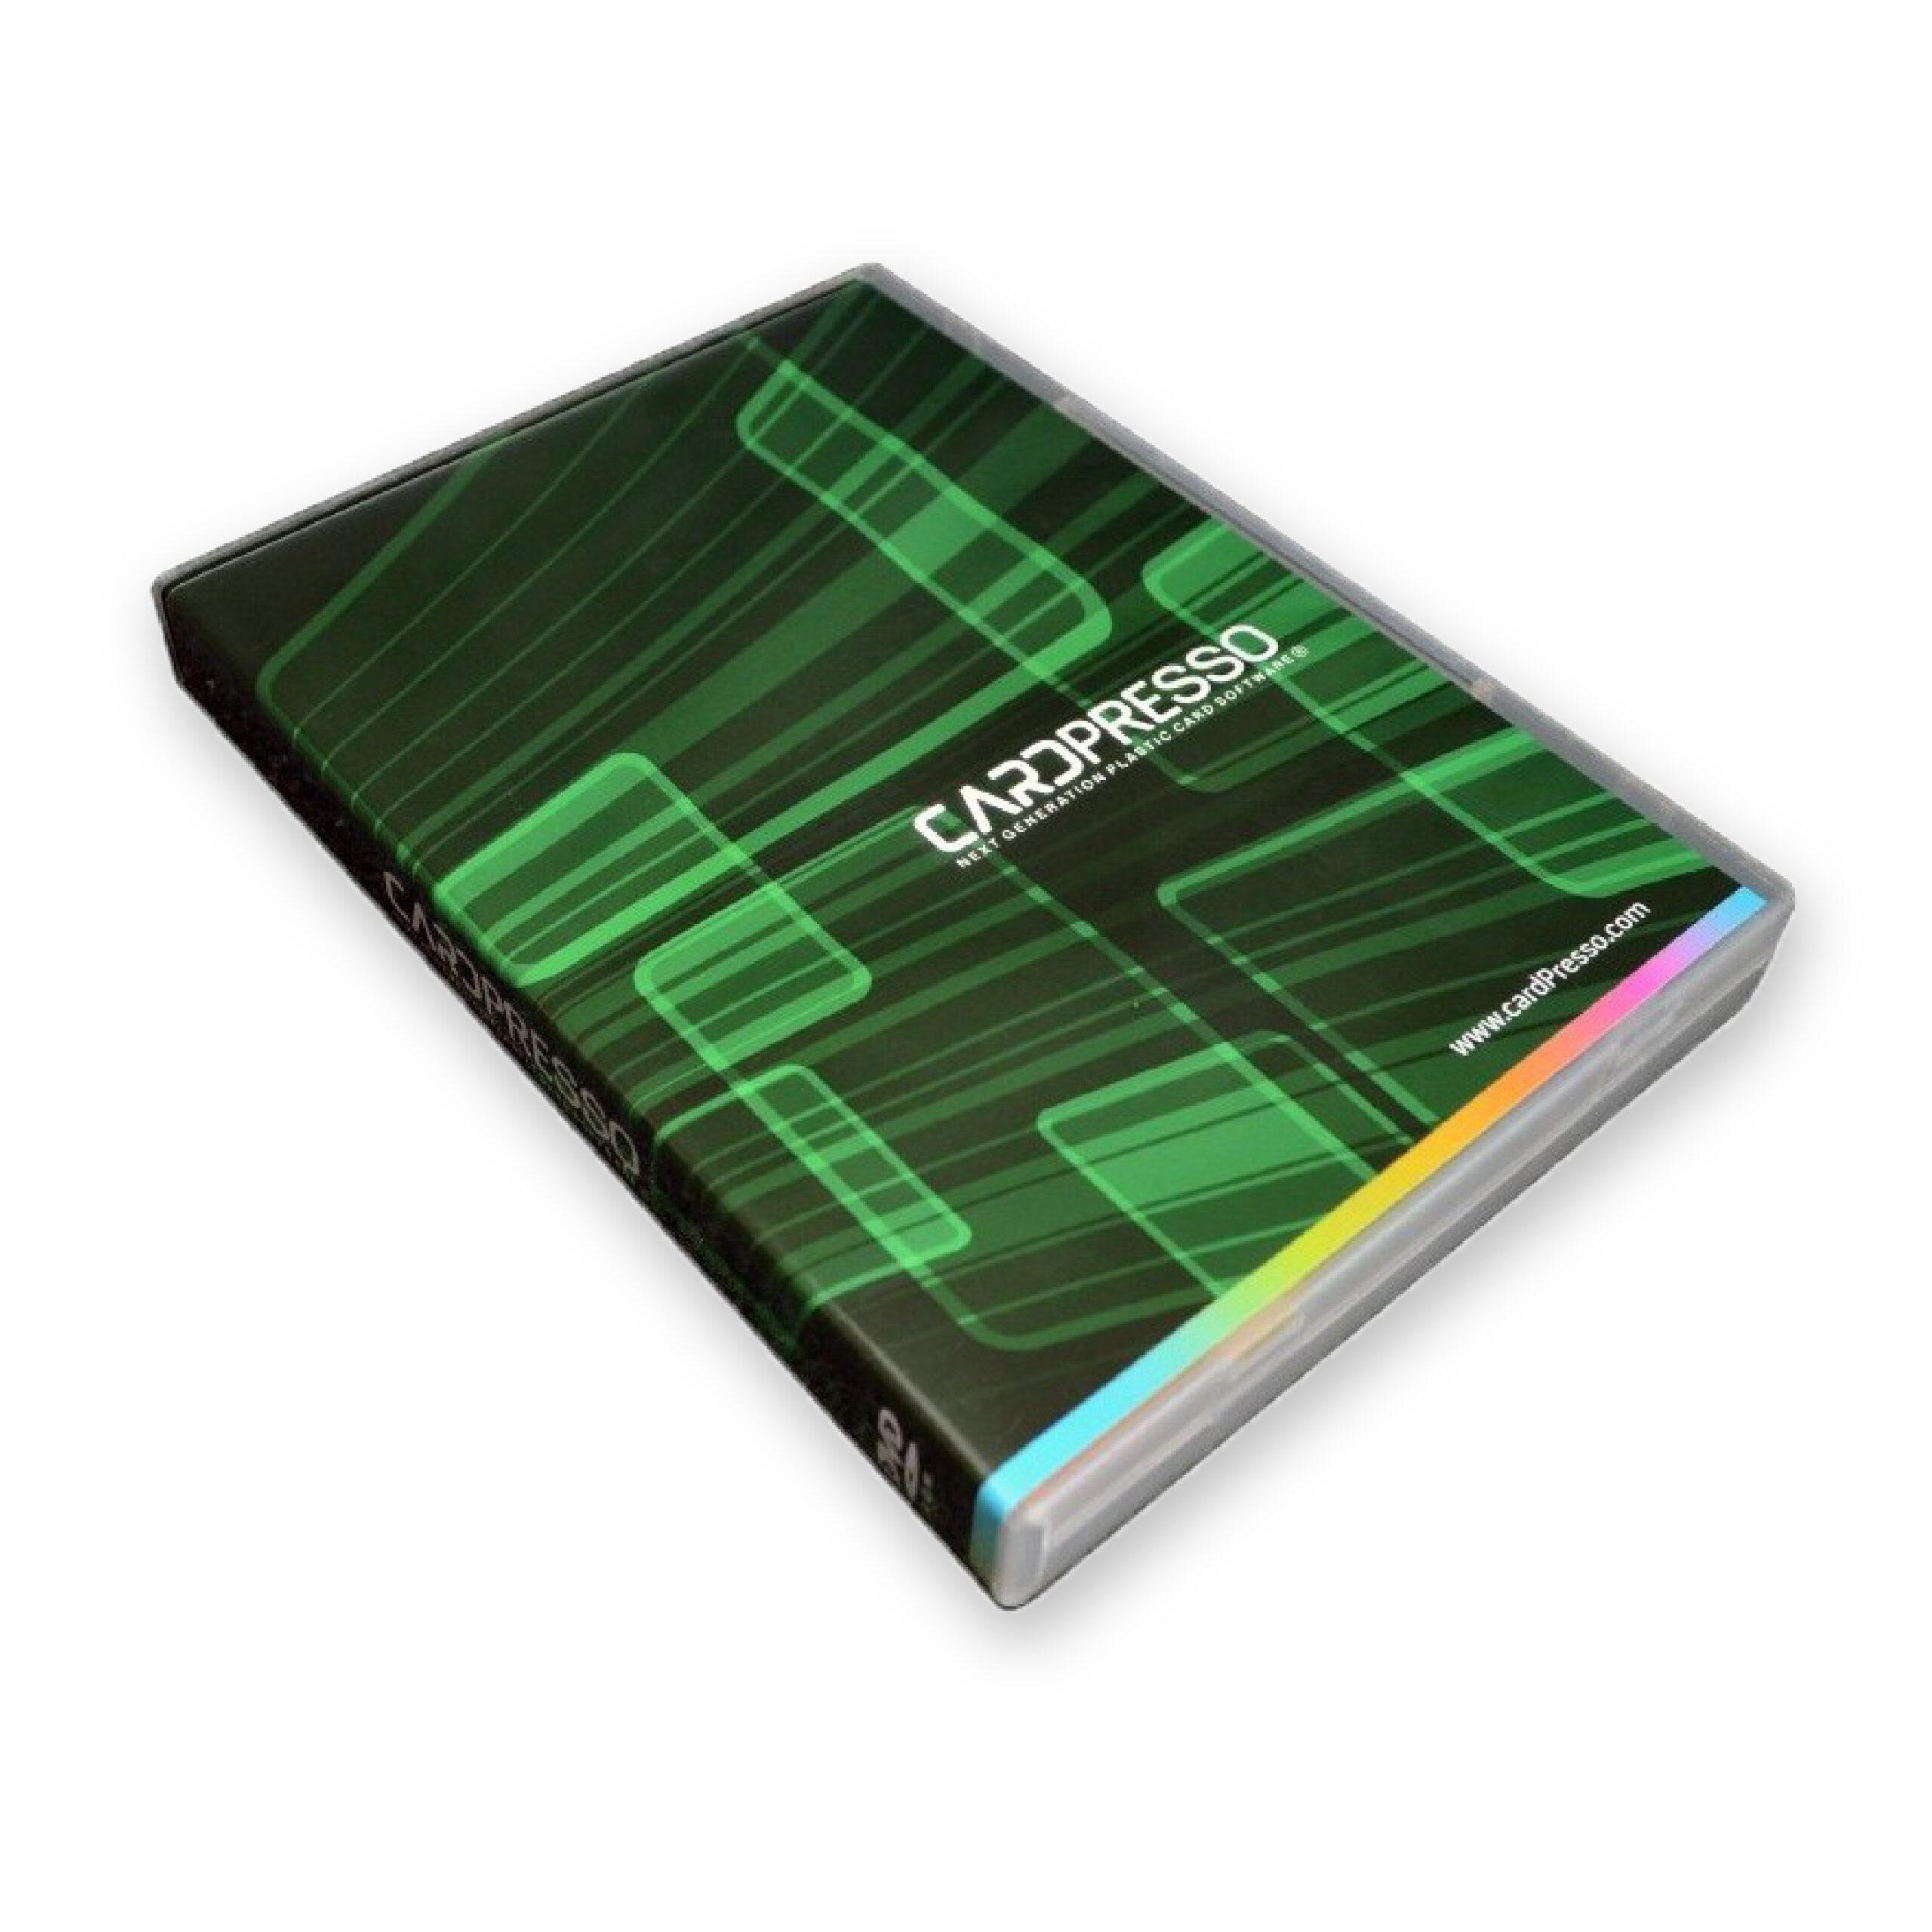 cardpresso - Cardnology